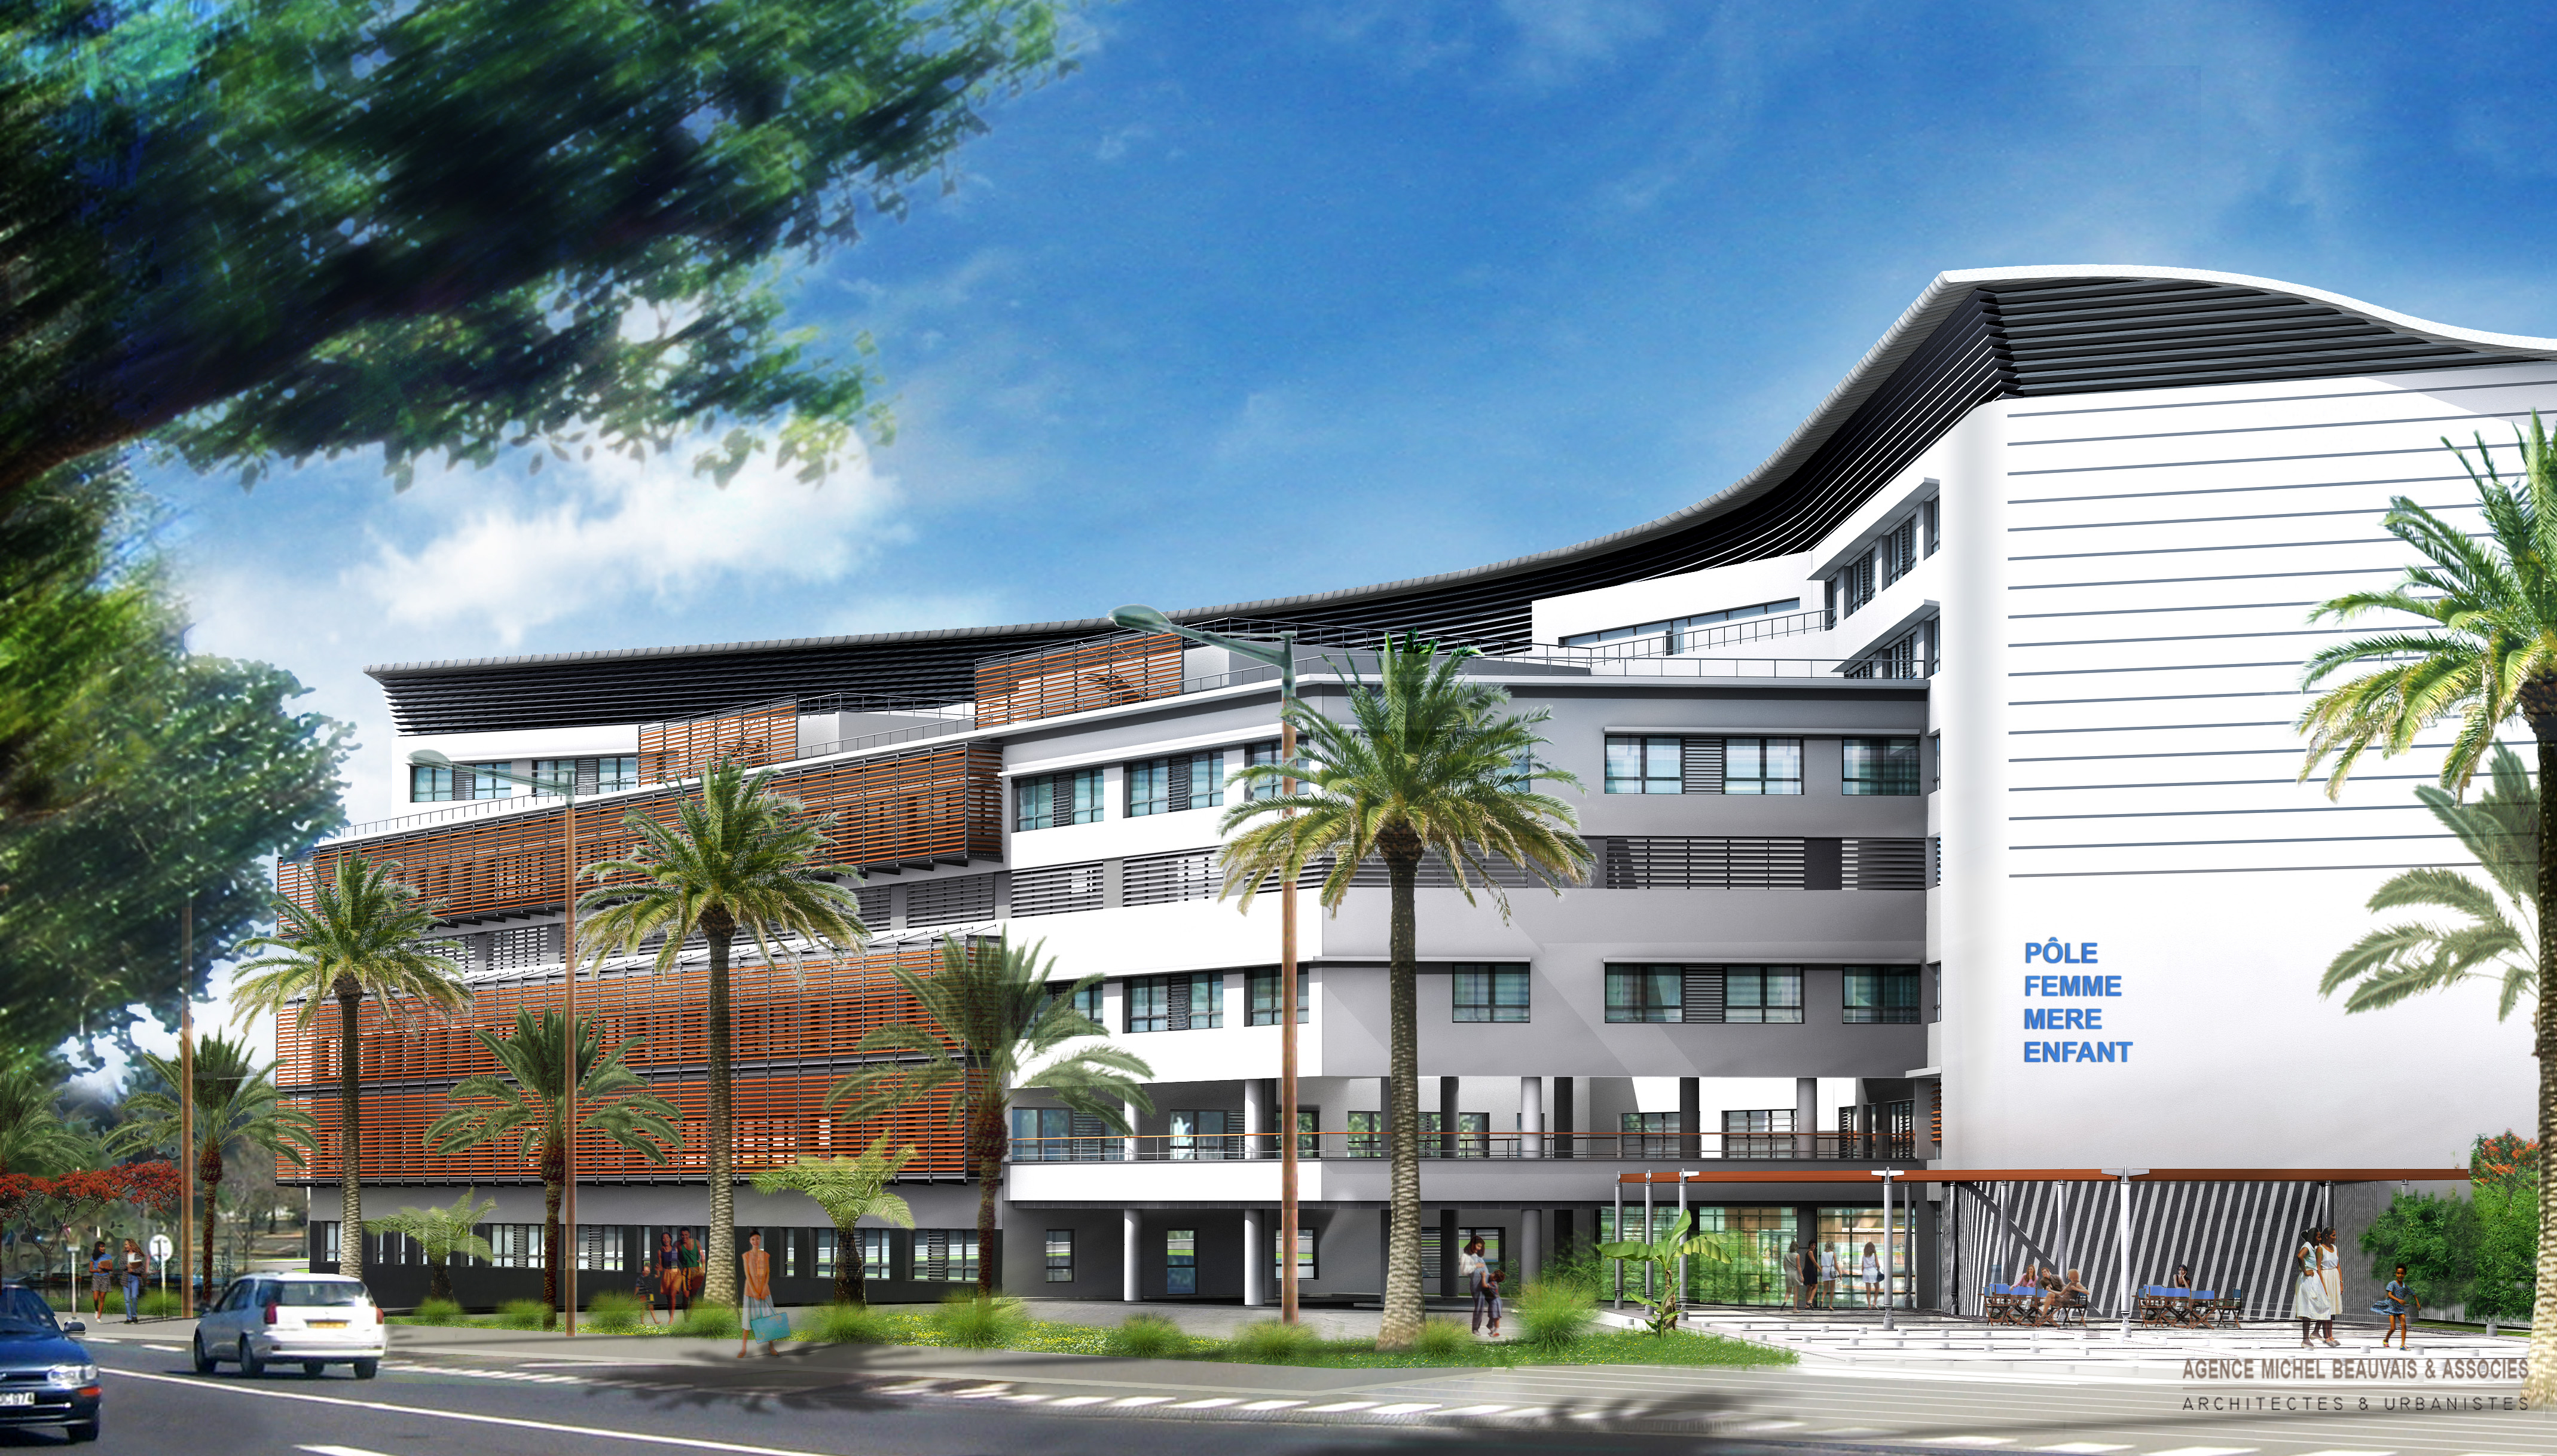 ISAUTIER - SAINT PIERRE DE LA REUNION (97) - Hôpital Sud Réunion